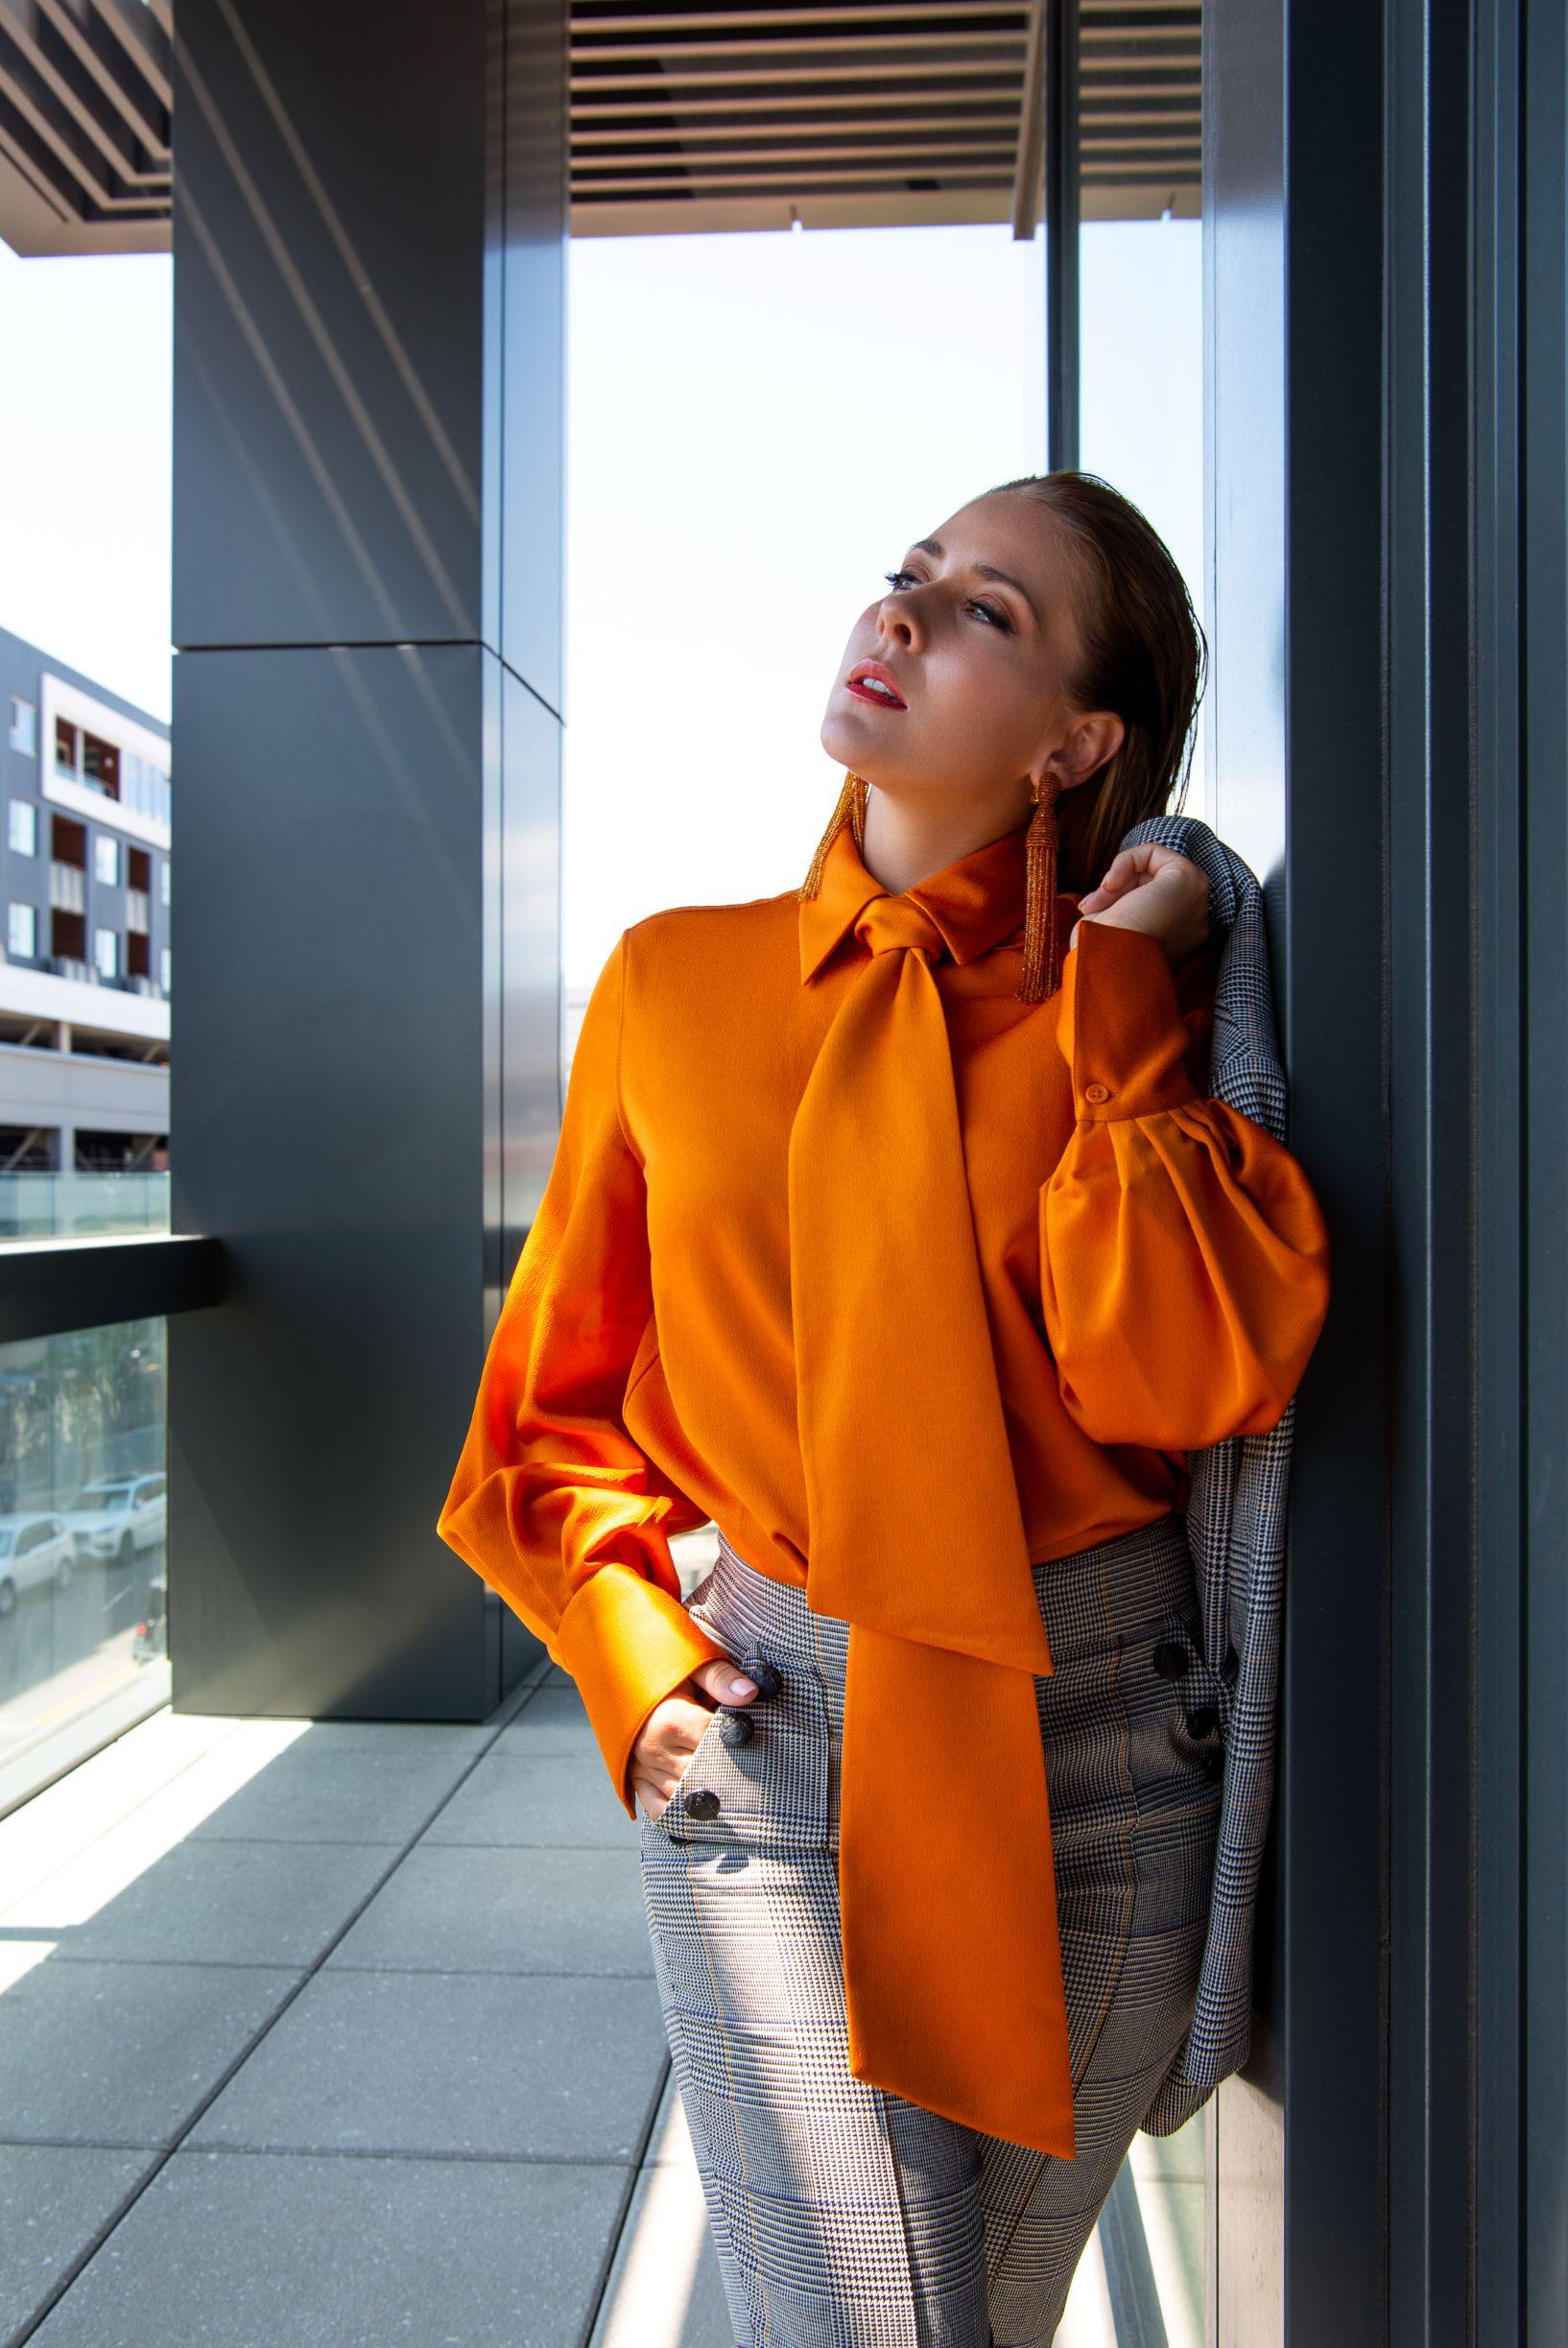 Blazer & pants: Veronica Beard, Blouse: Equipment, Pumps: Jimmy Choo, Earrings: Oscar de la Renta